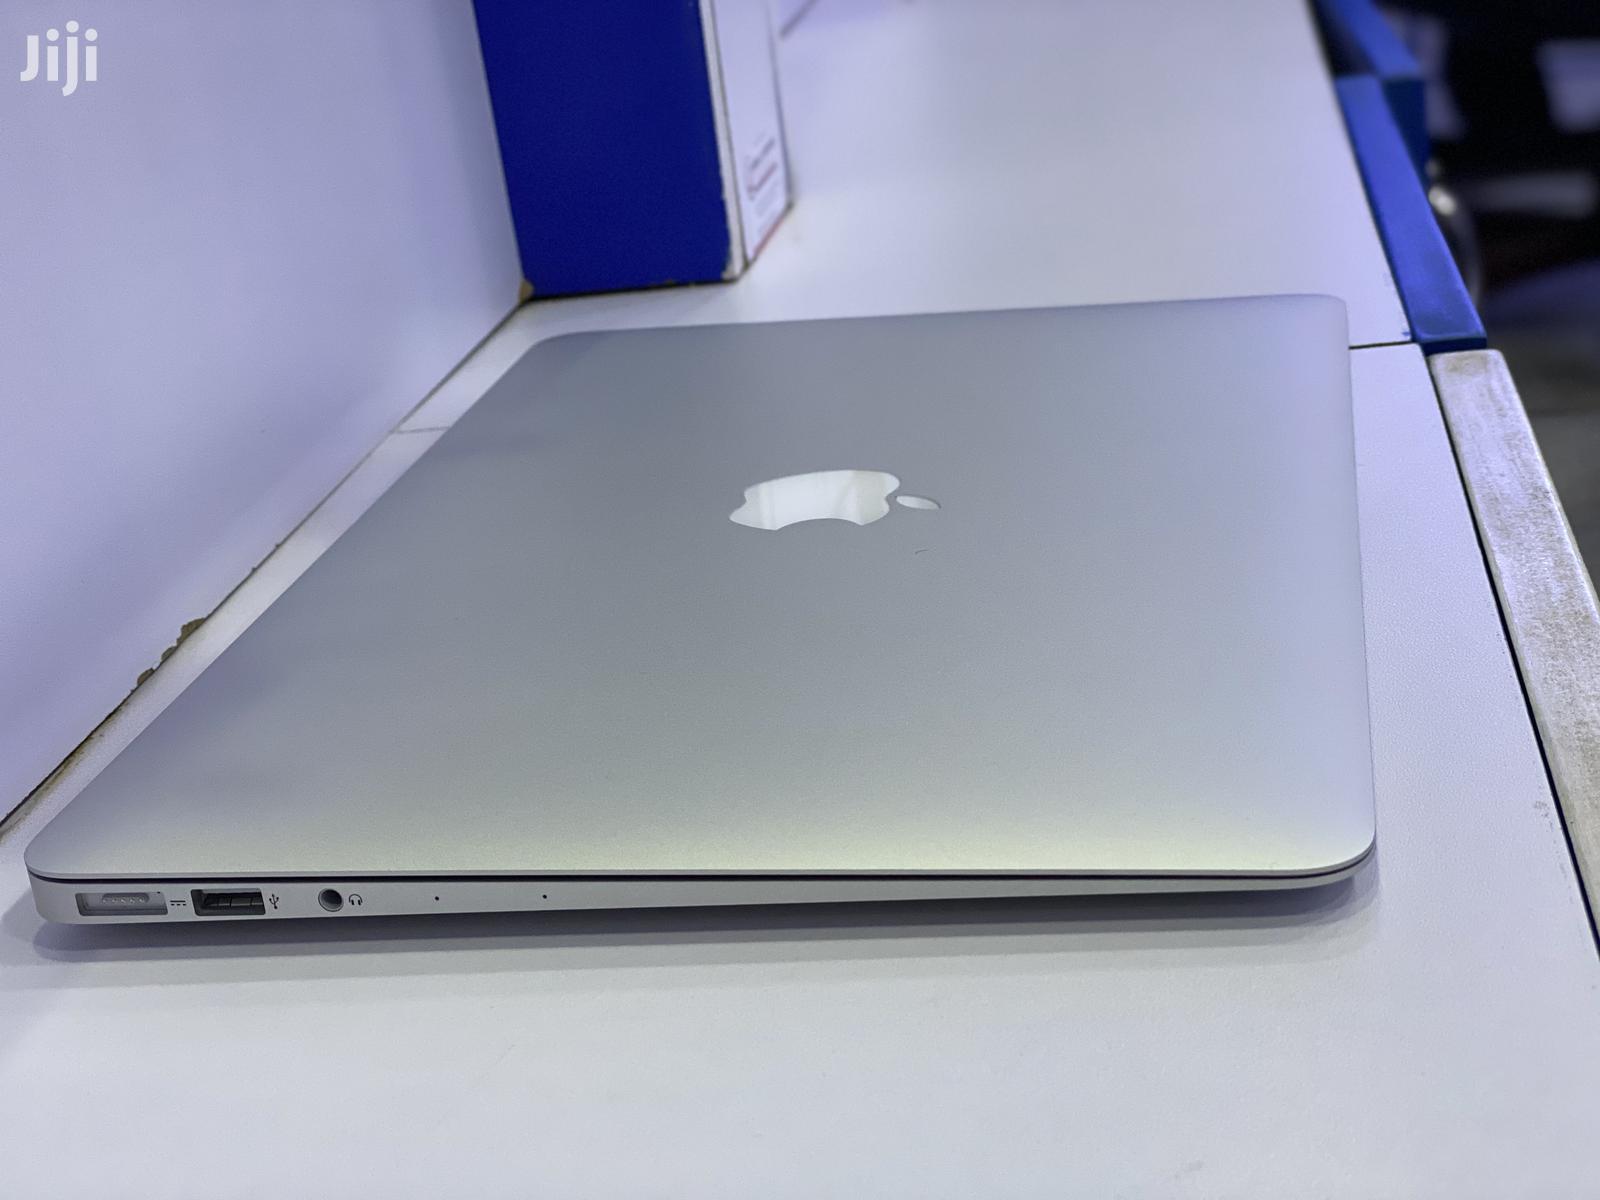 New Laptop Apple MacBook Air 4GB Intel Core I5 SSHD (Hybrid) 256GB   Laptops & Computers for sale in Kampala, Central Region, Uganda